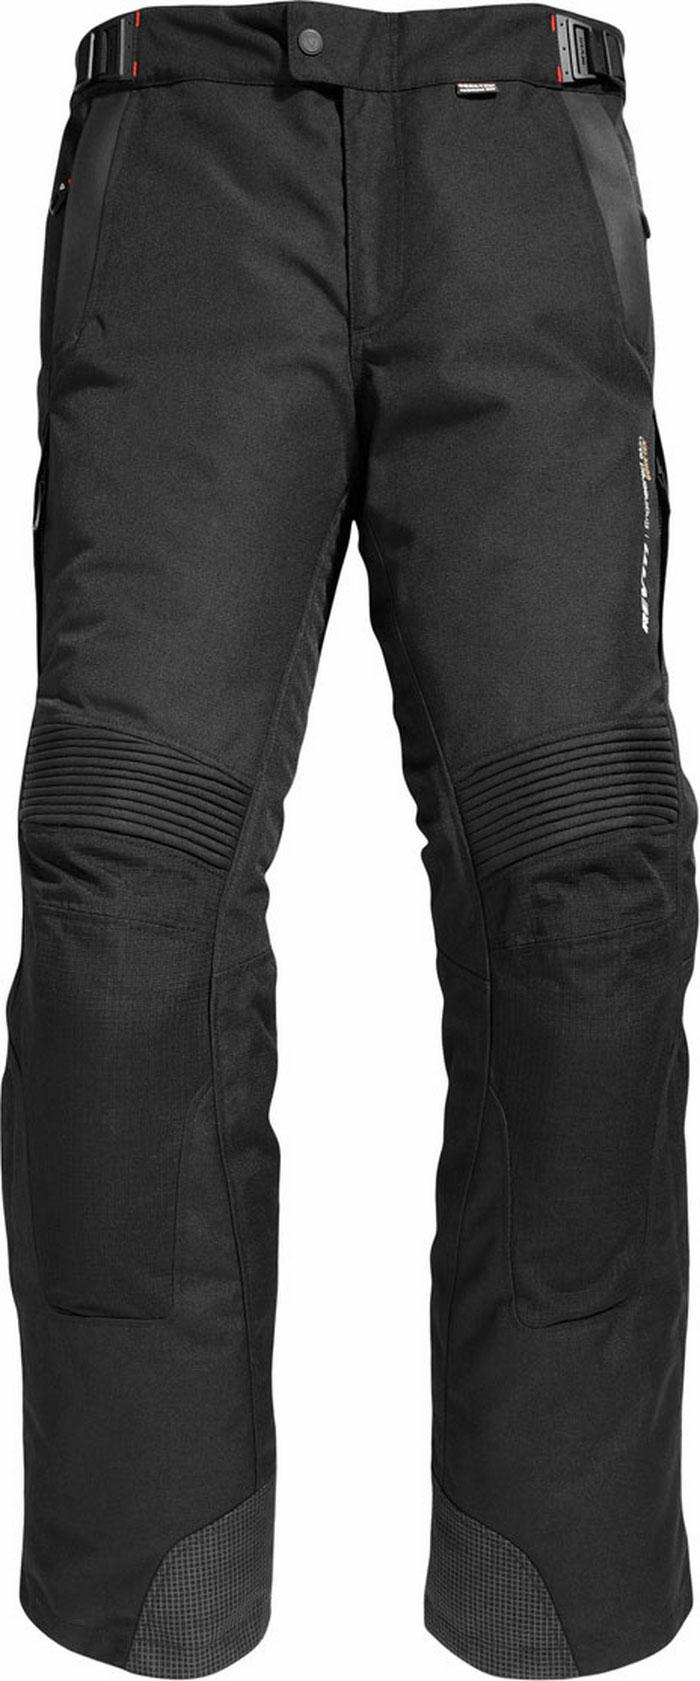 Pantaloni moto Rev'it Legacy GTX - Accorciato